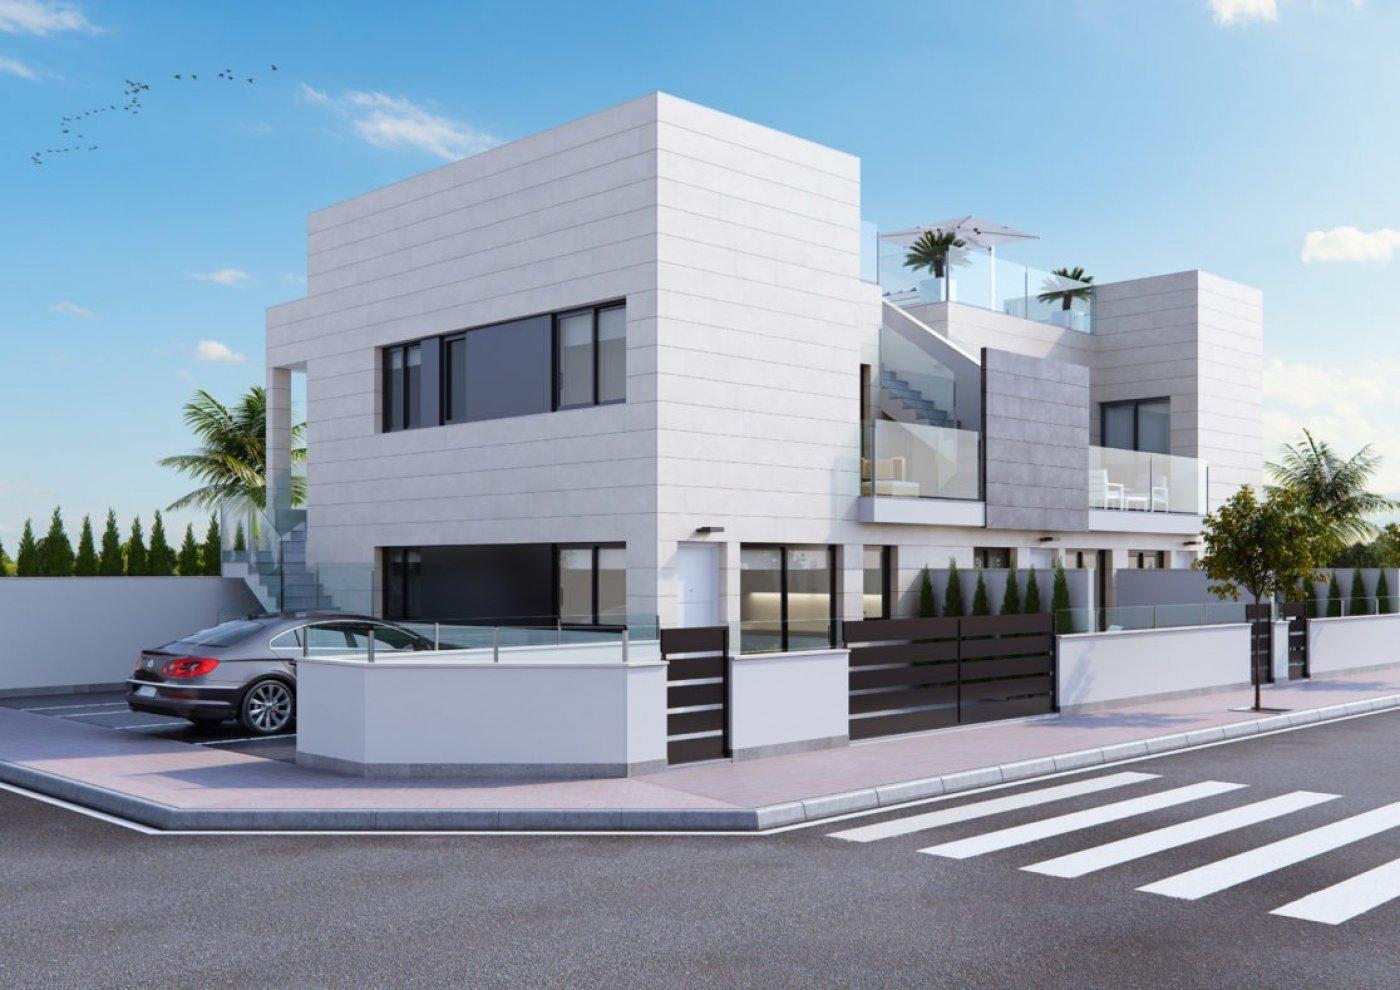 Galerijafbeelding 1 of Laatste begane grond appartement in El Mojón 70 meter van het strand